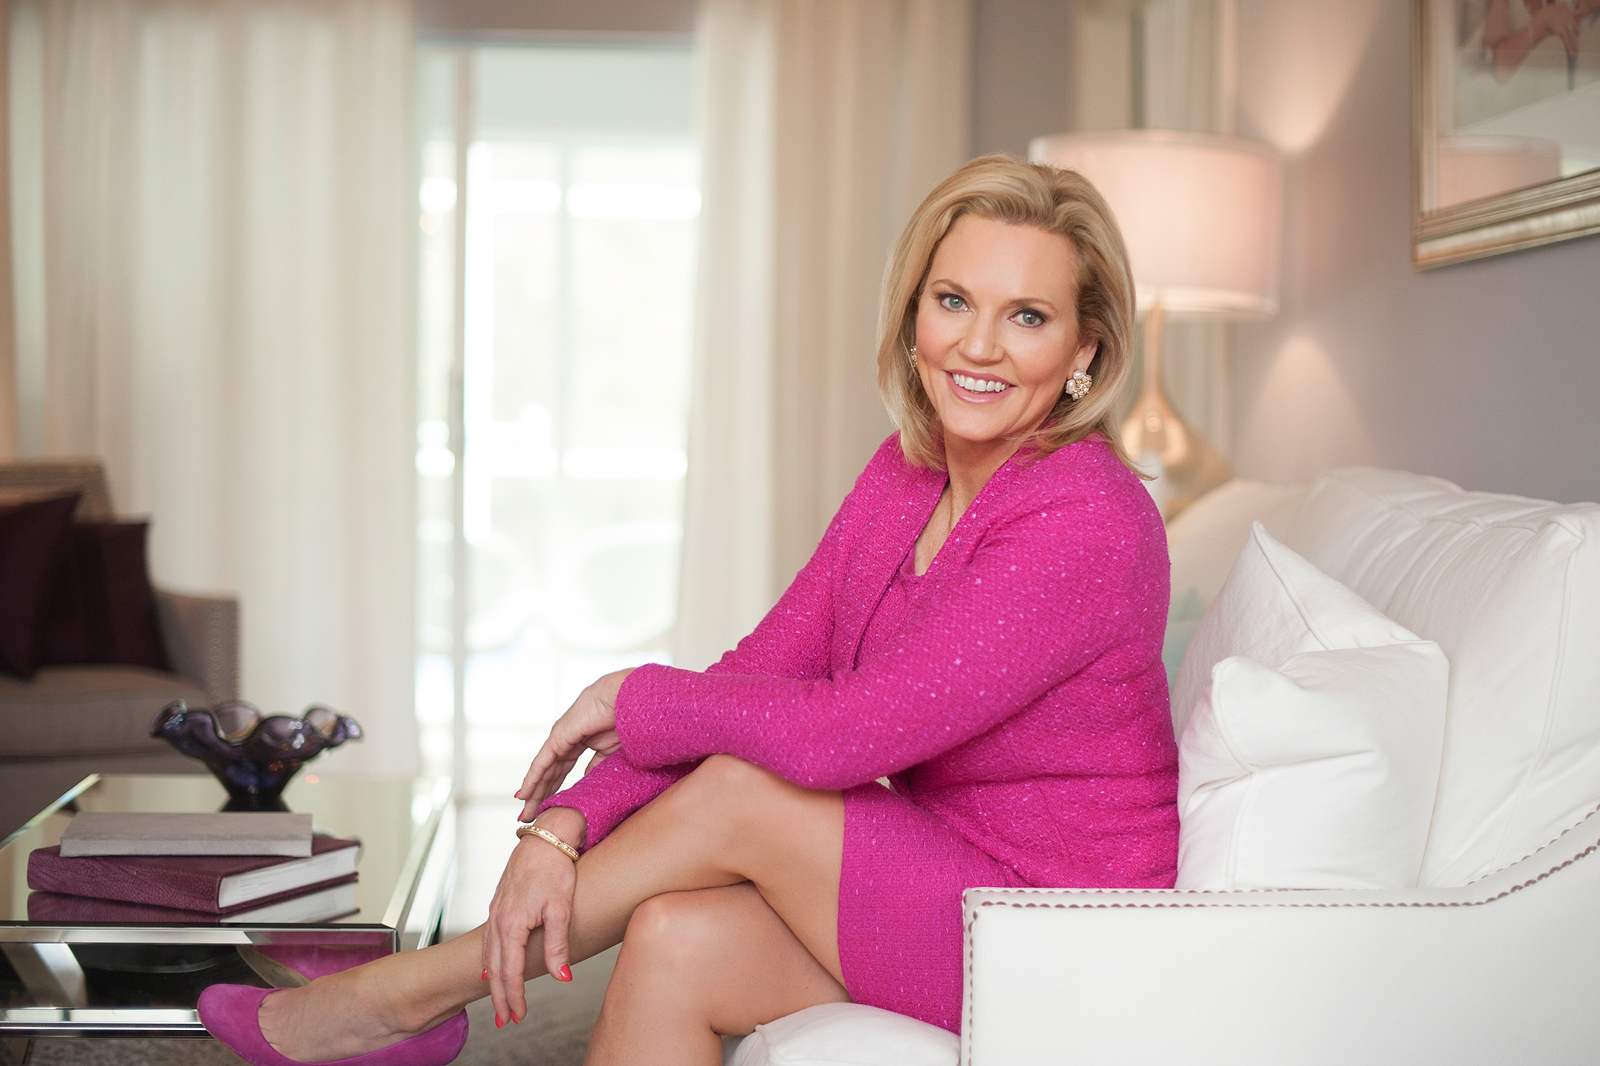 02-relaxed-fashionable-headshot-living-room-politician-beautiful-approachable-elegant-professional.jpg